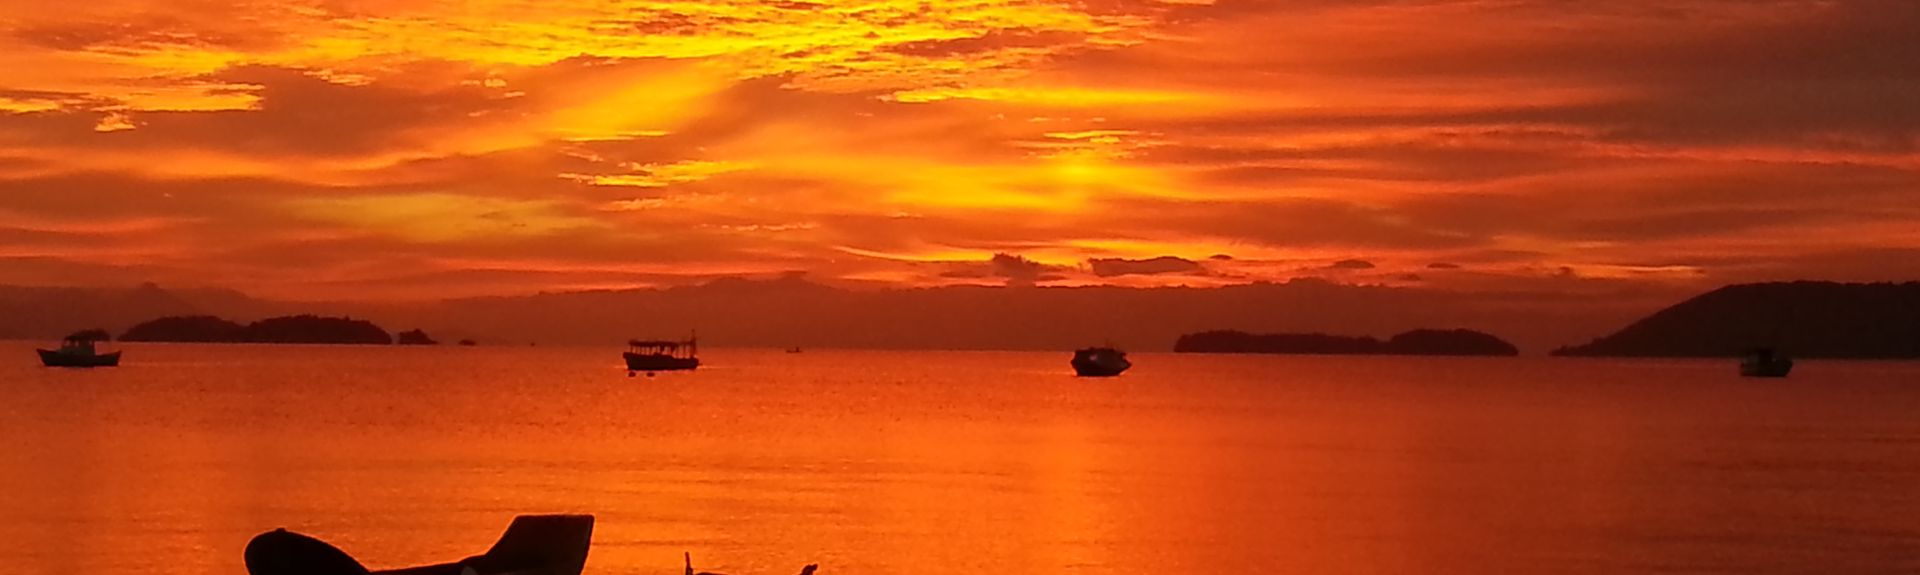 Caborê, Paraty, Região Sudeste, Brasil